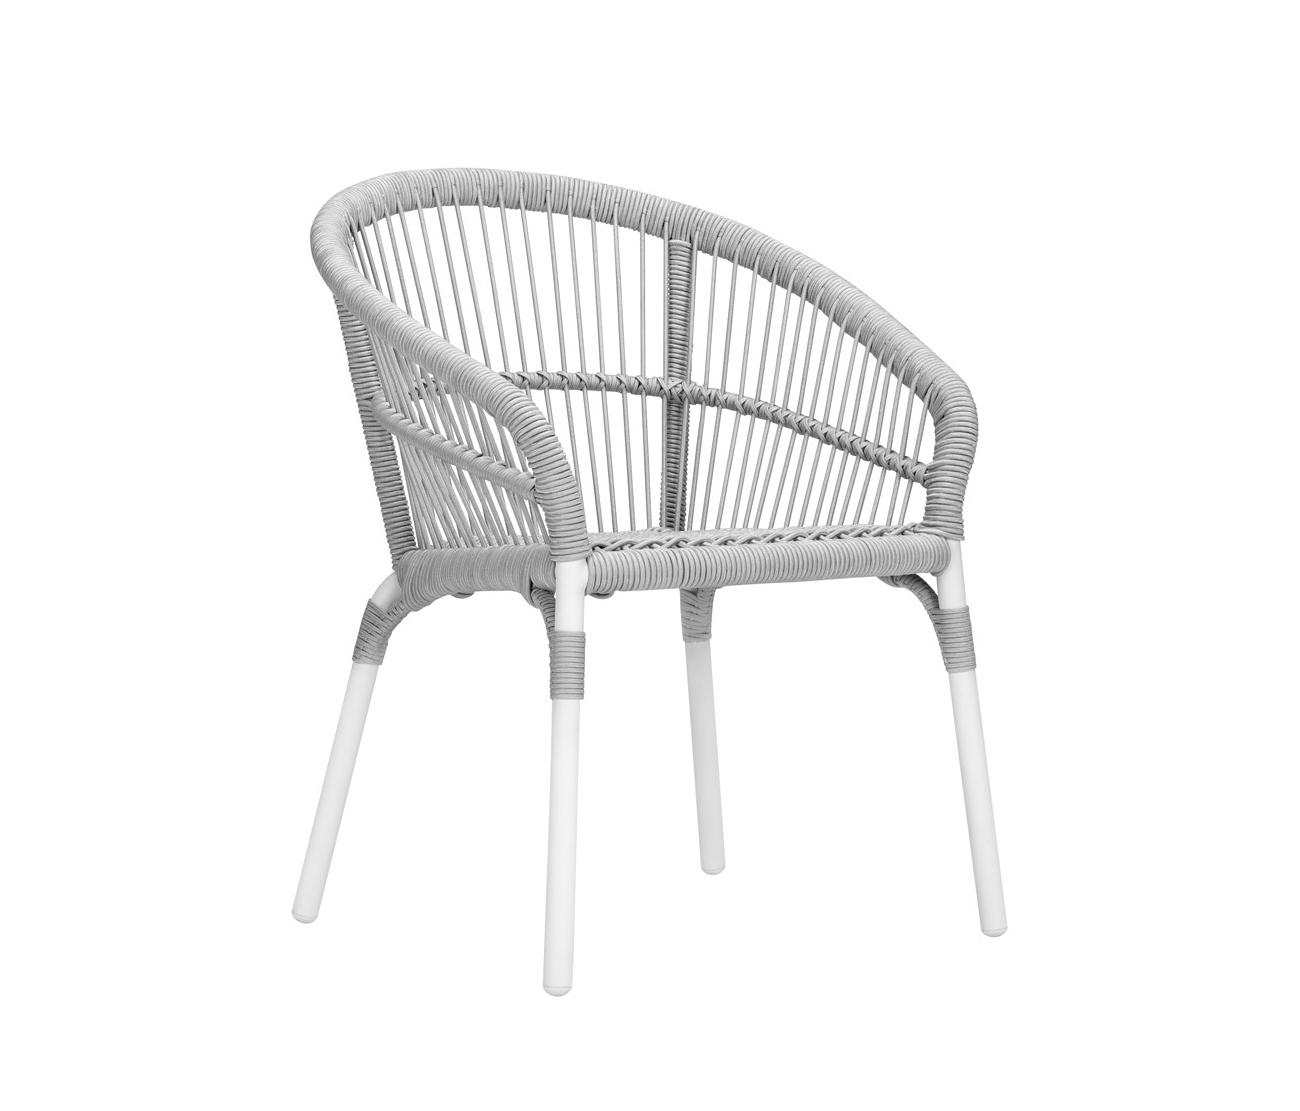 NEXUS ARMCHAIR By JANUS Et Cie | Chairs ...